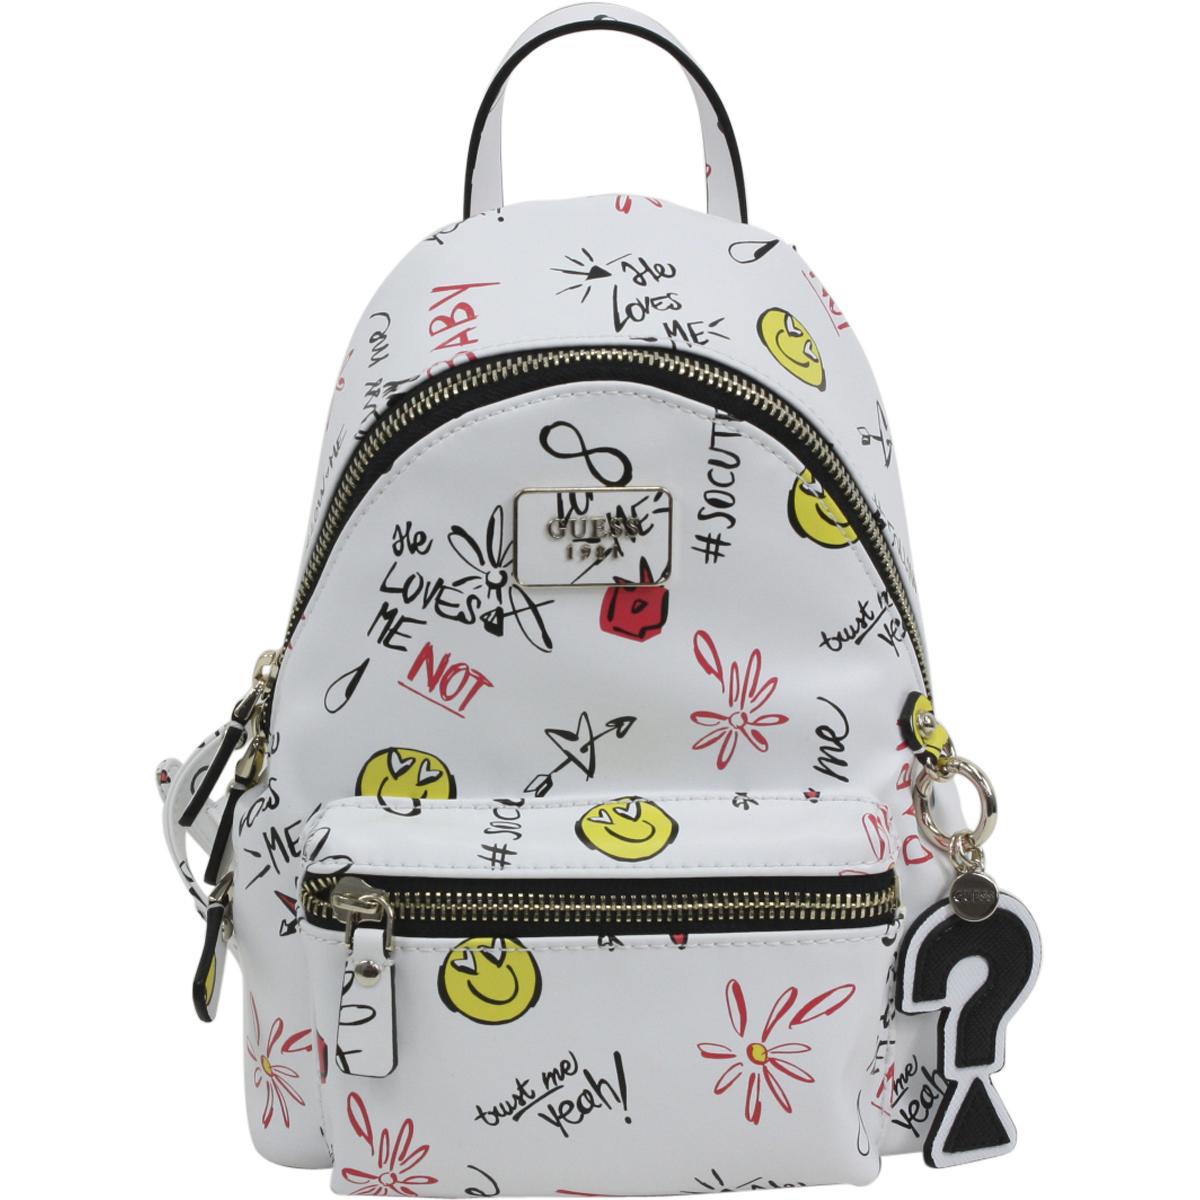 Guess Women's Cool School Small Leeza Book Bag Backpack   eBay